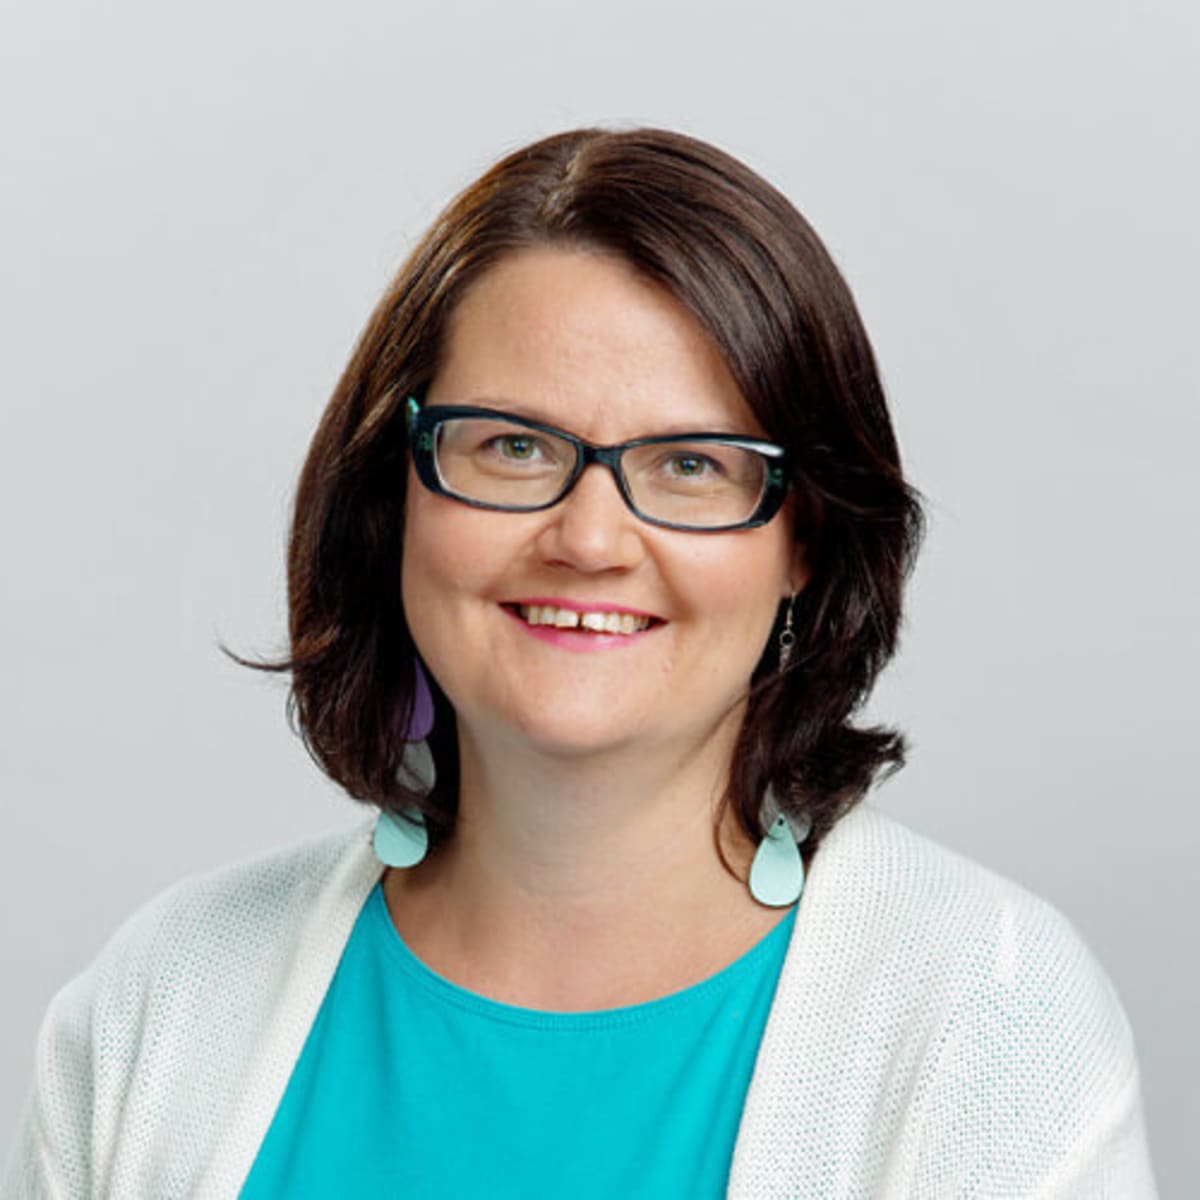 Minna Janhonen